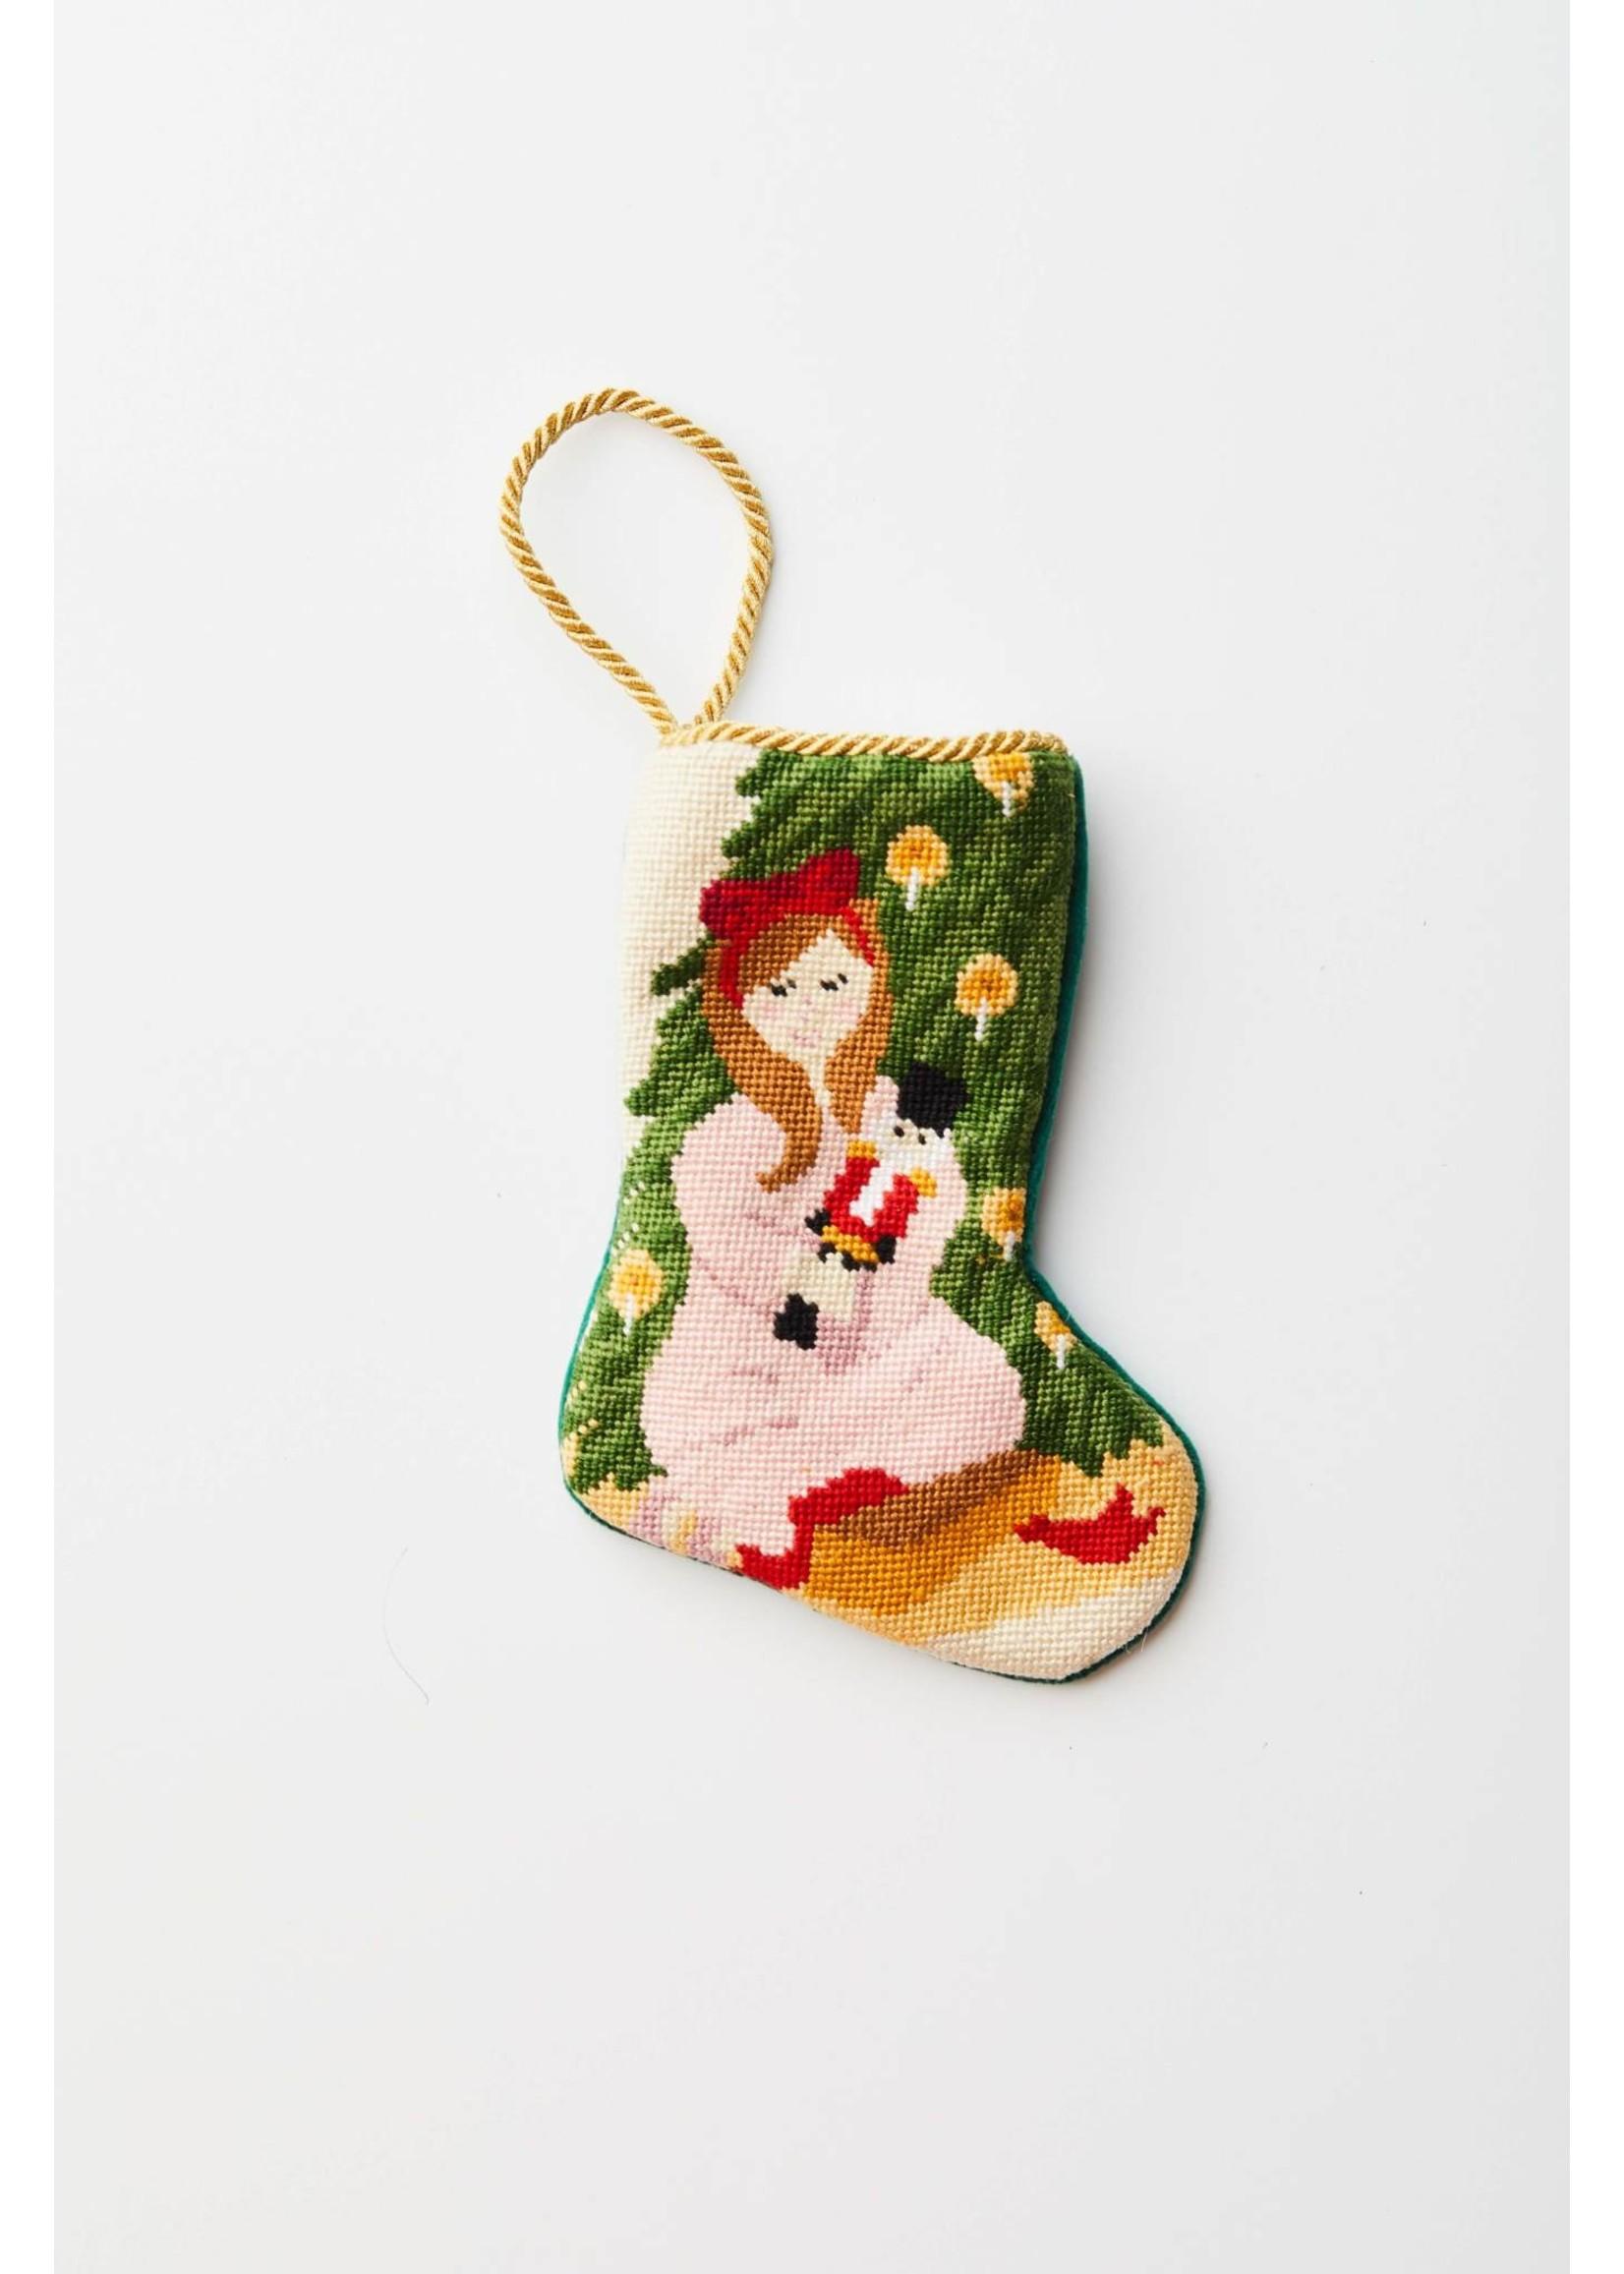 Bauble Stockings Bauble Stocking - Clara